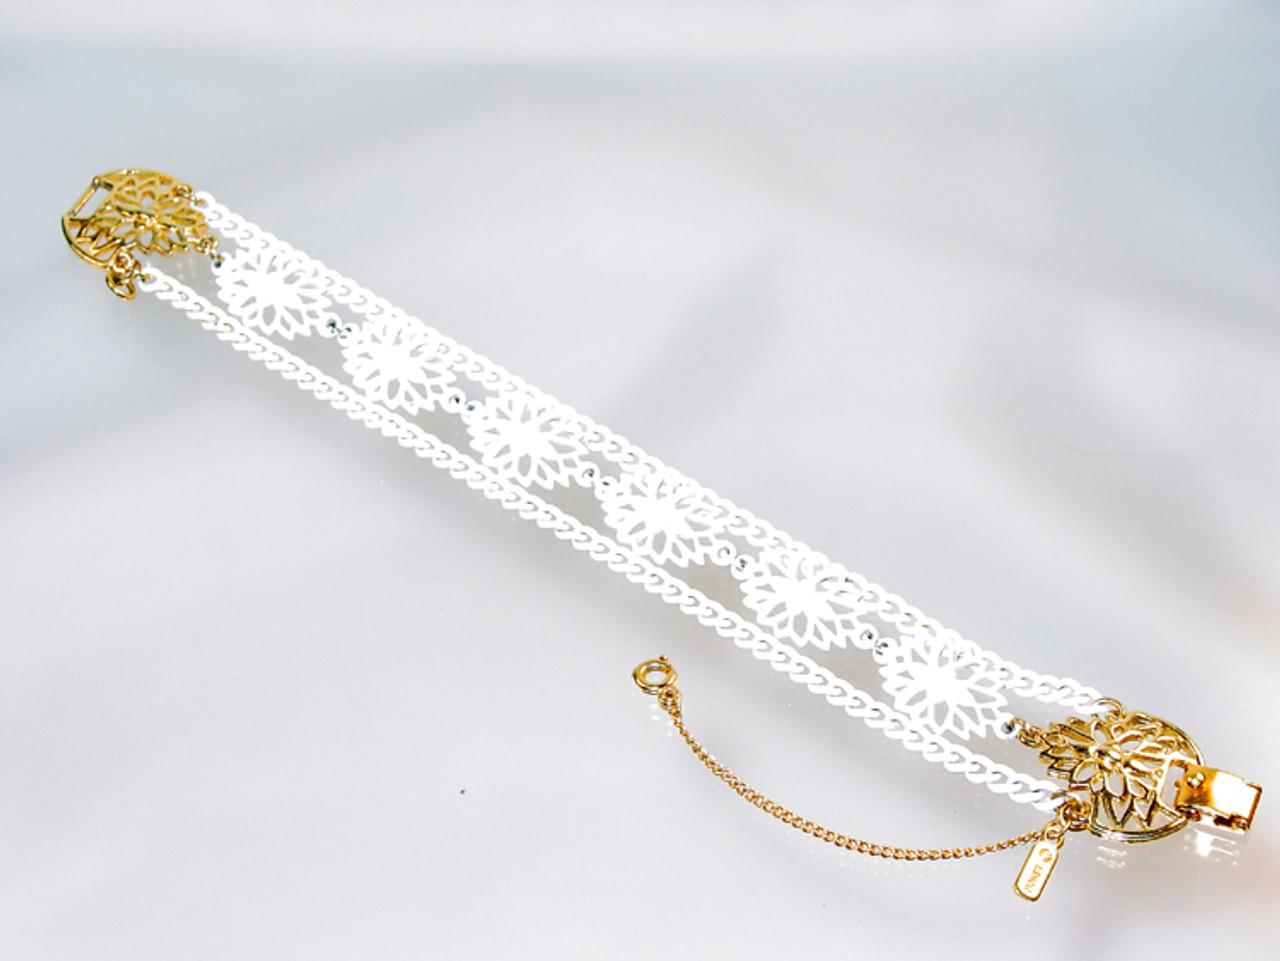 1960 Monet Enamel Bracelet